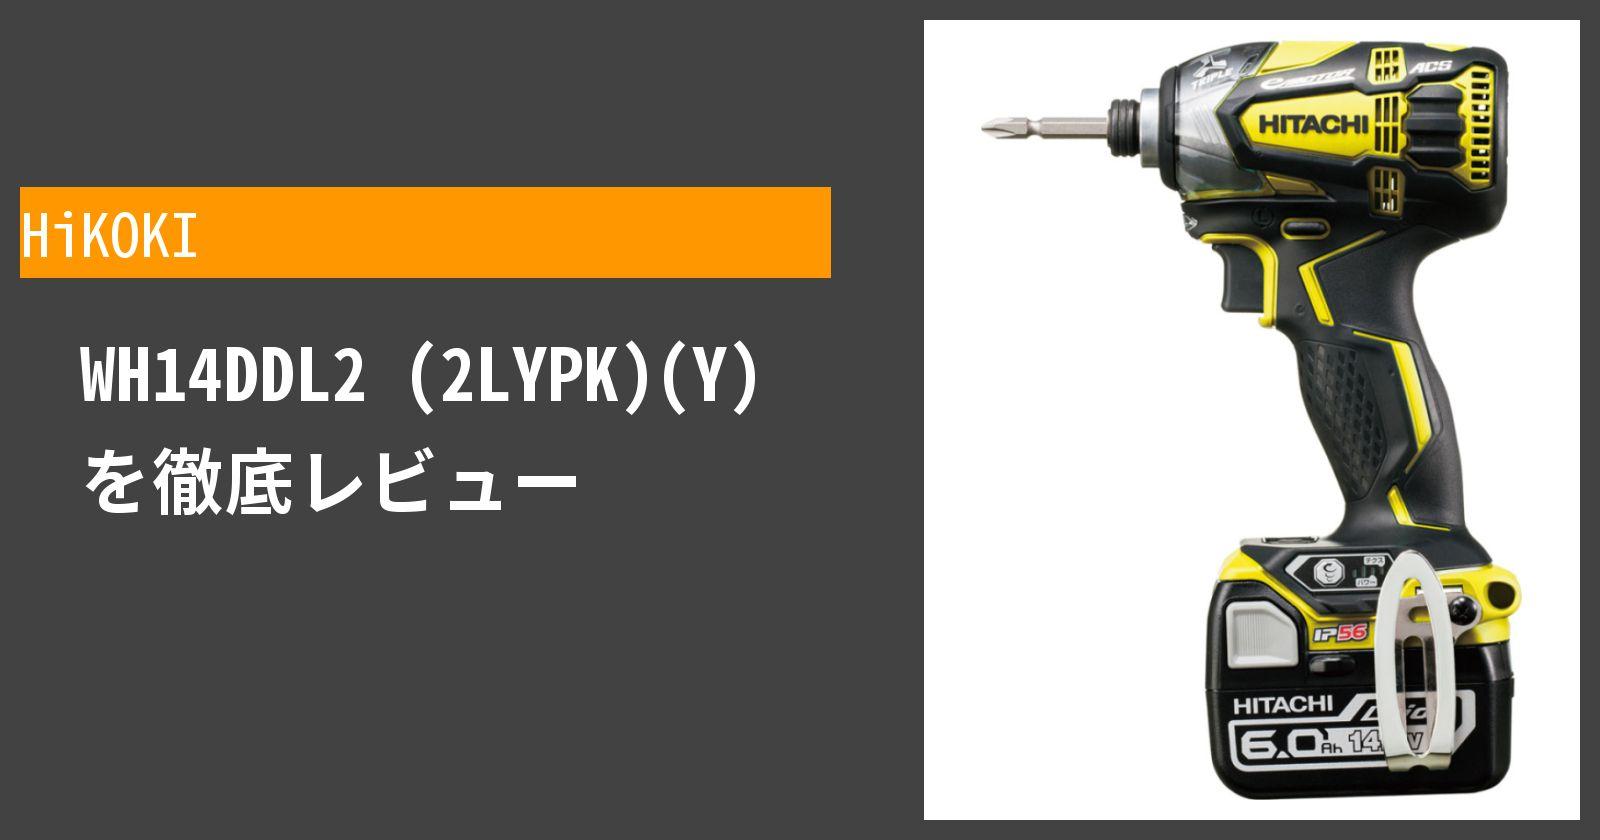 WH14DDL2 (2LYPK)(Y)を徹底評価